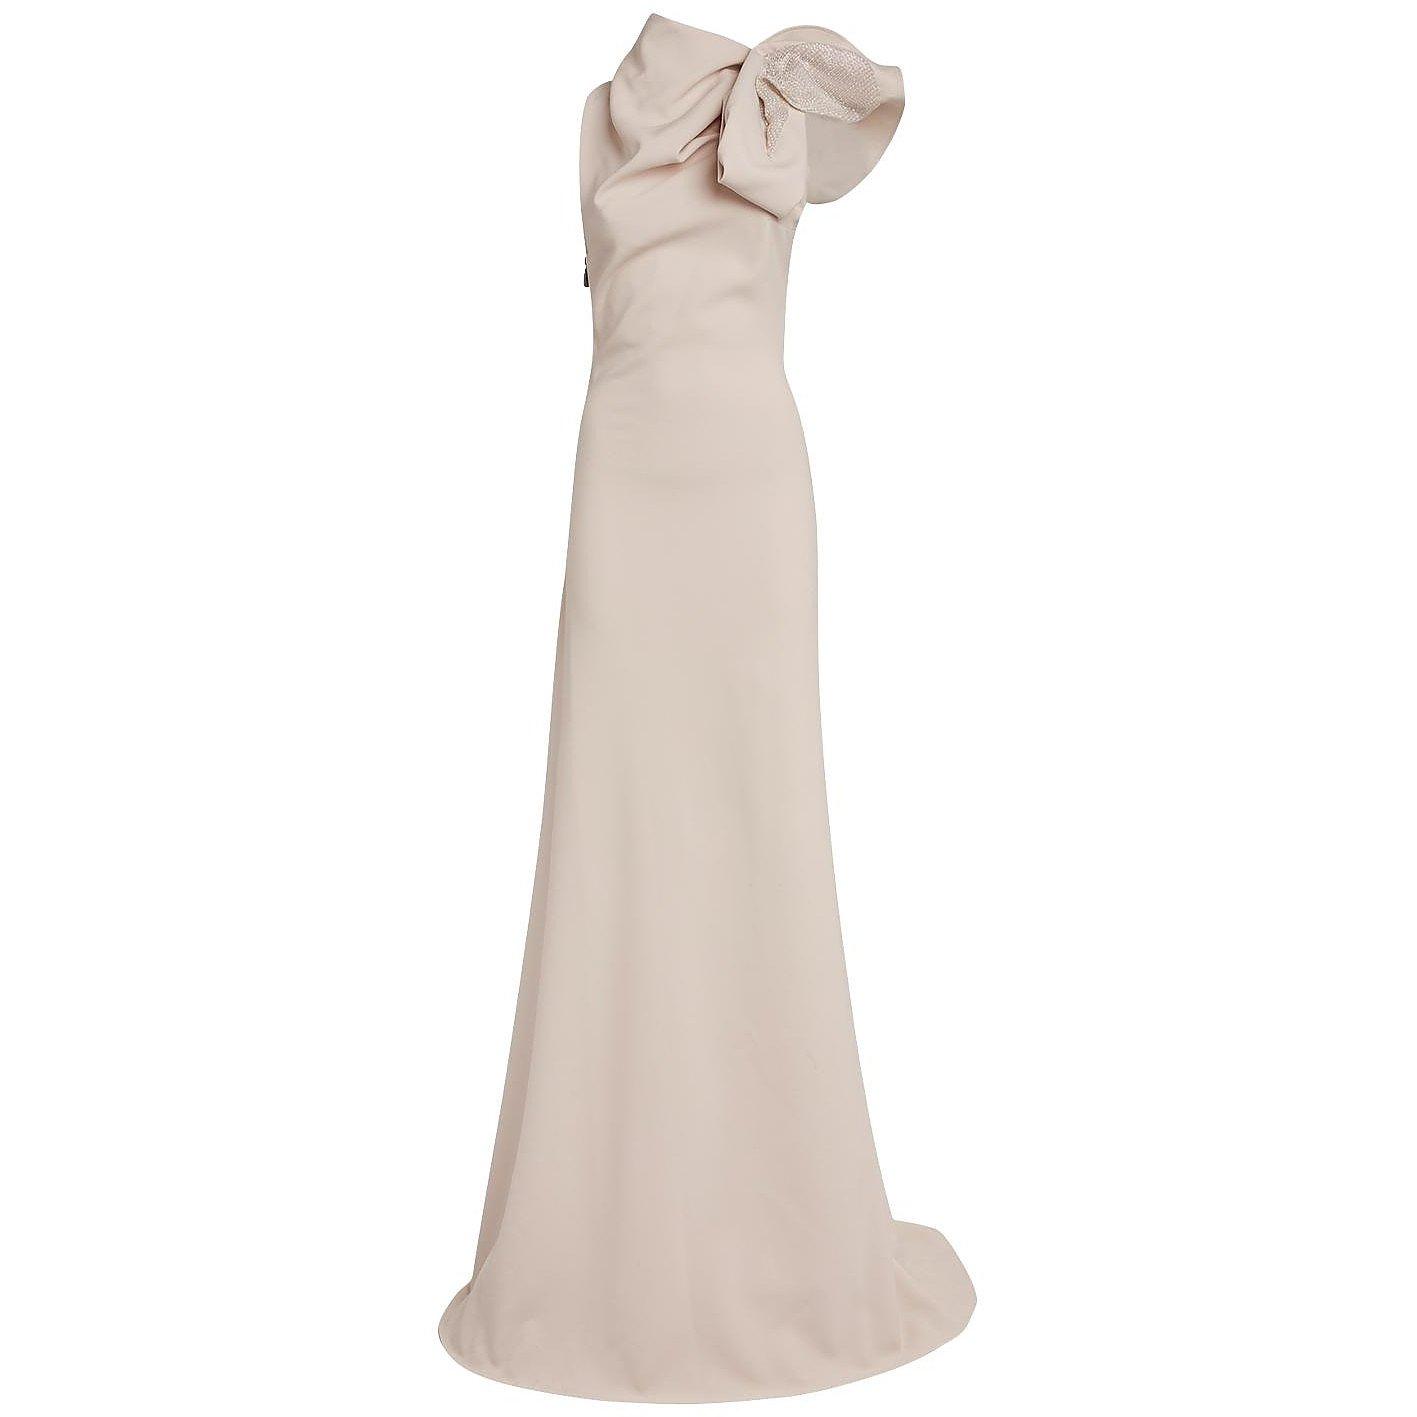 Maticevski Captivate Gown